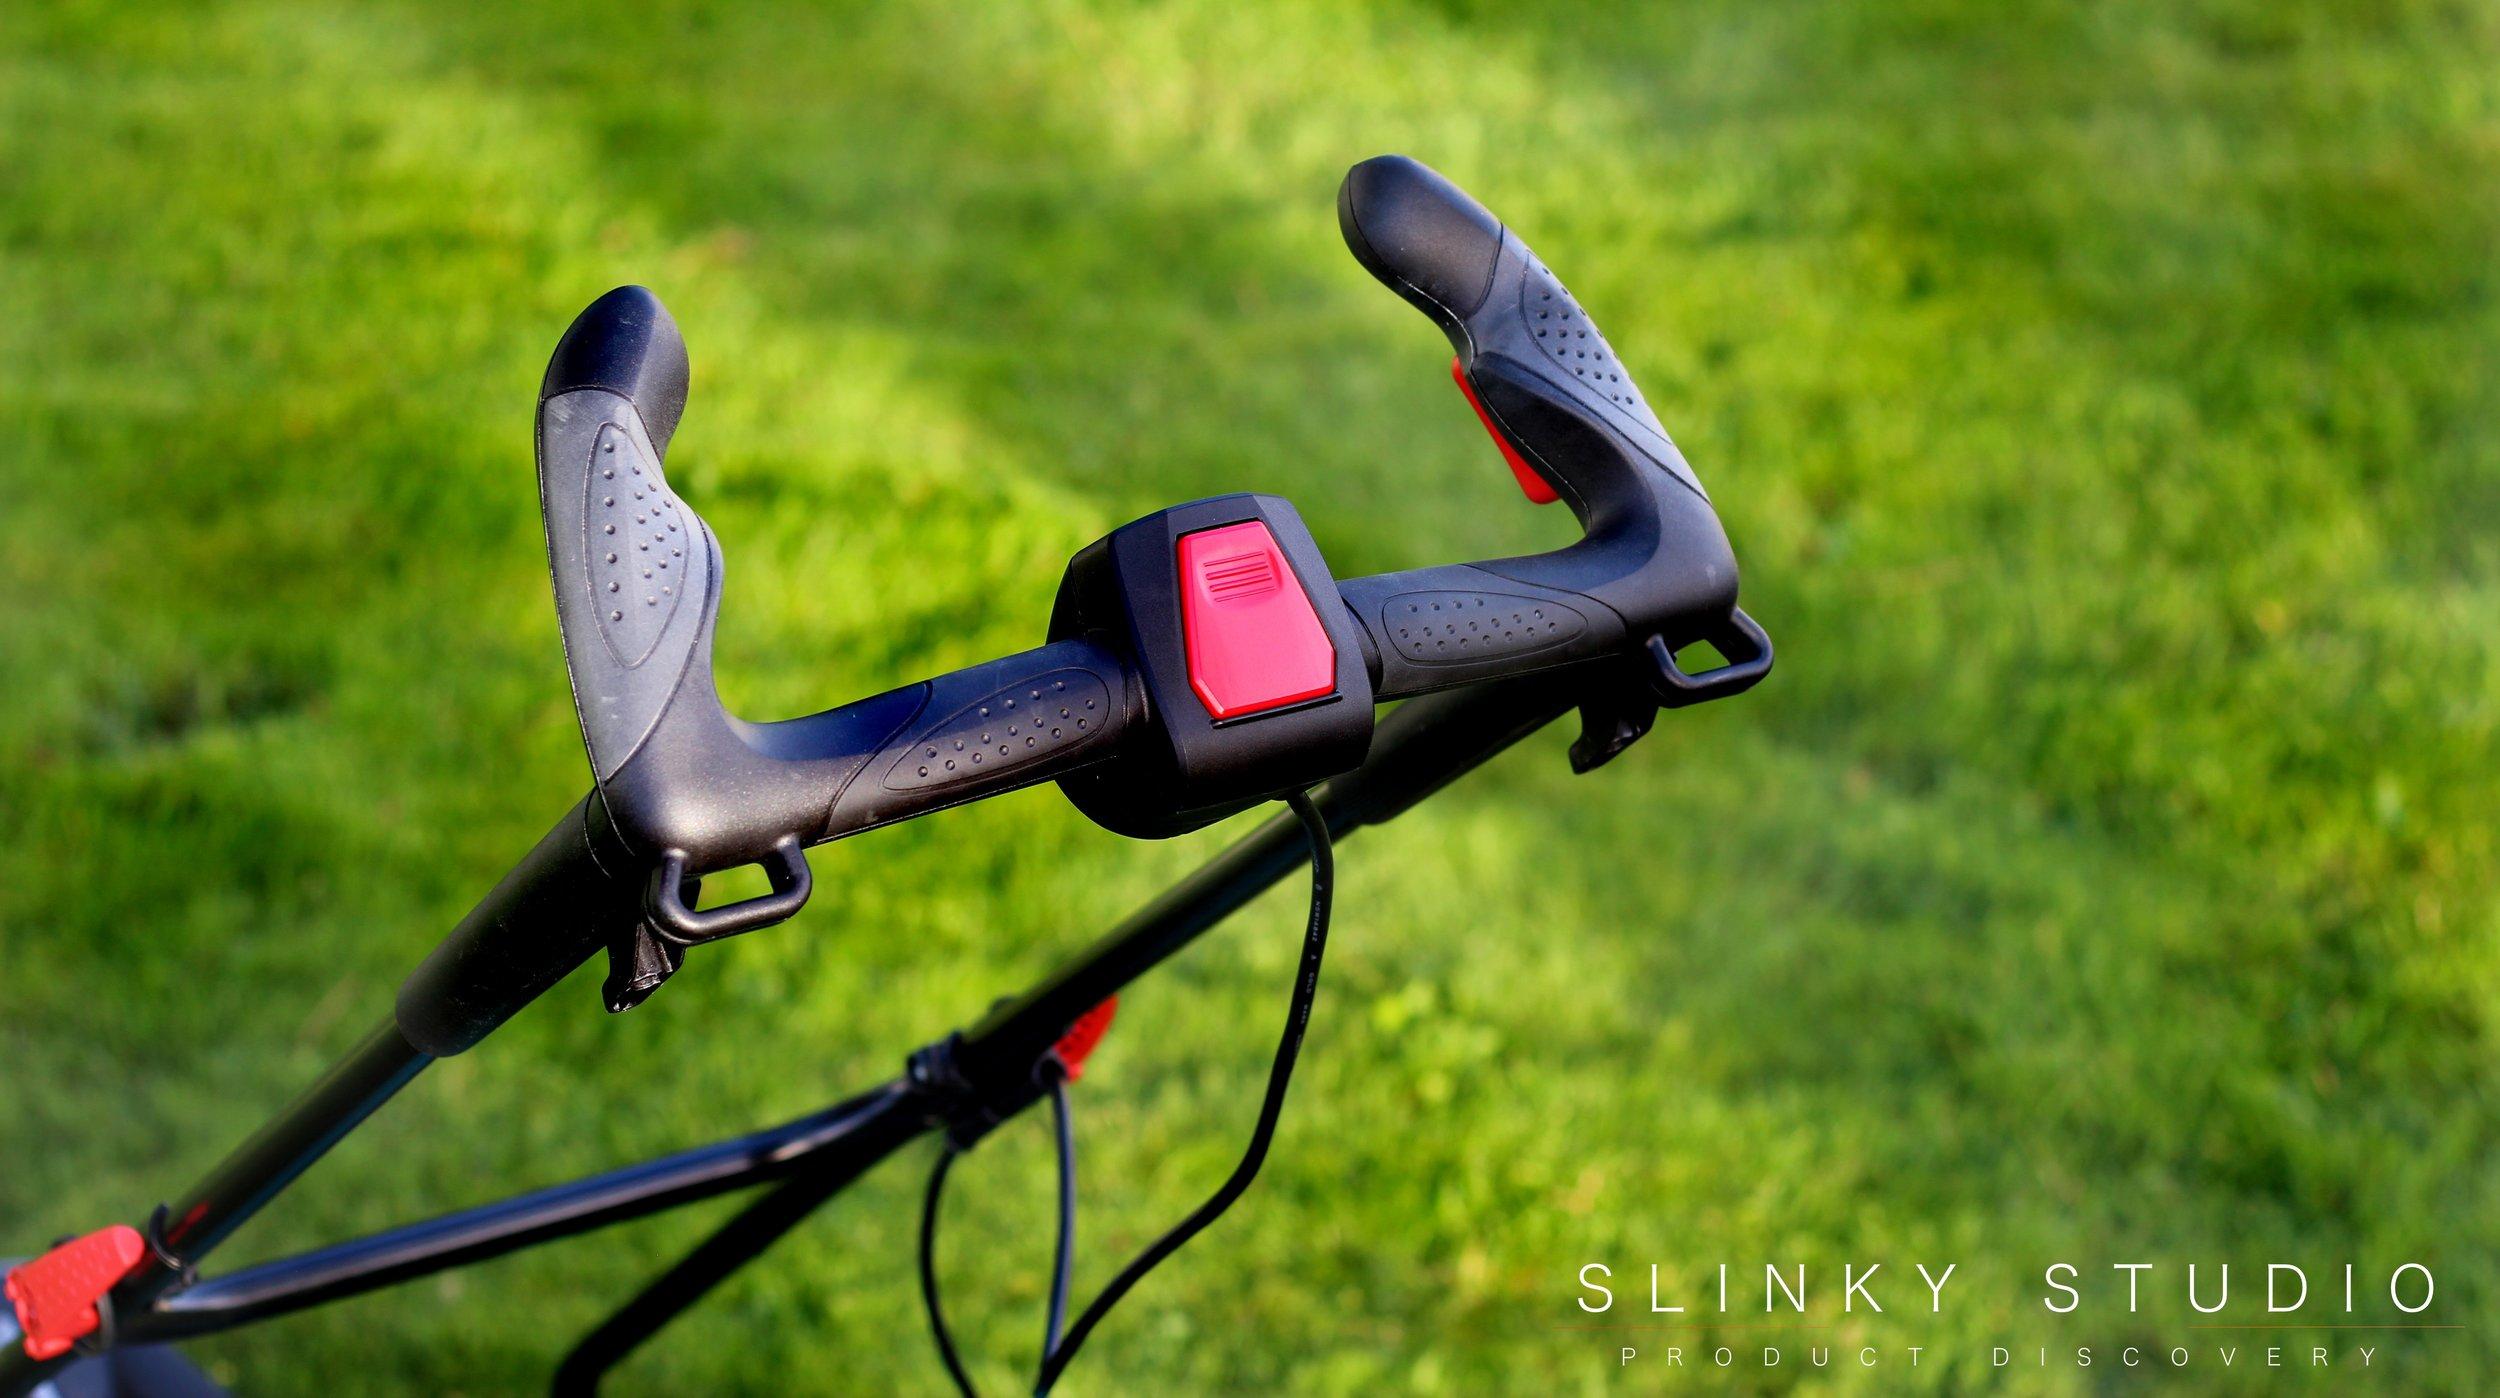 Bosch Rotak 43 LI Ergoflex Cordless Lawnmower Handle Above View of Grips.jpg